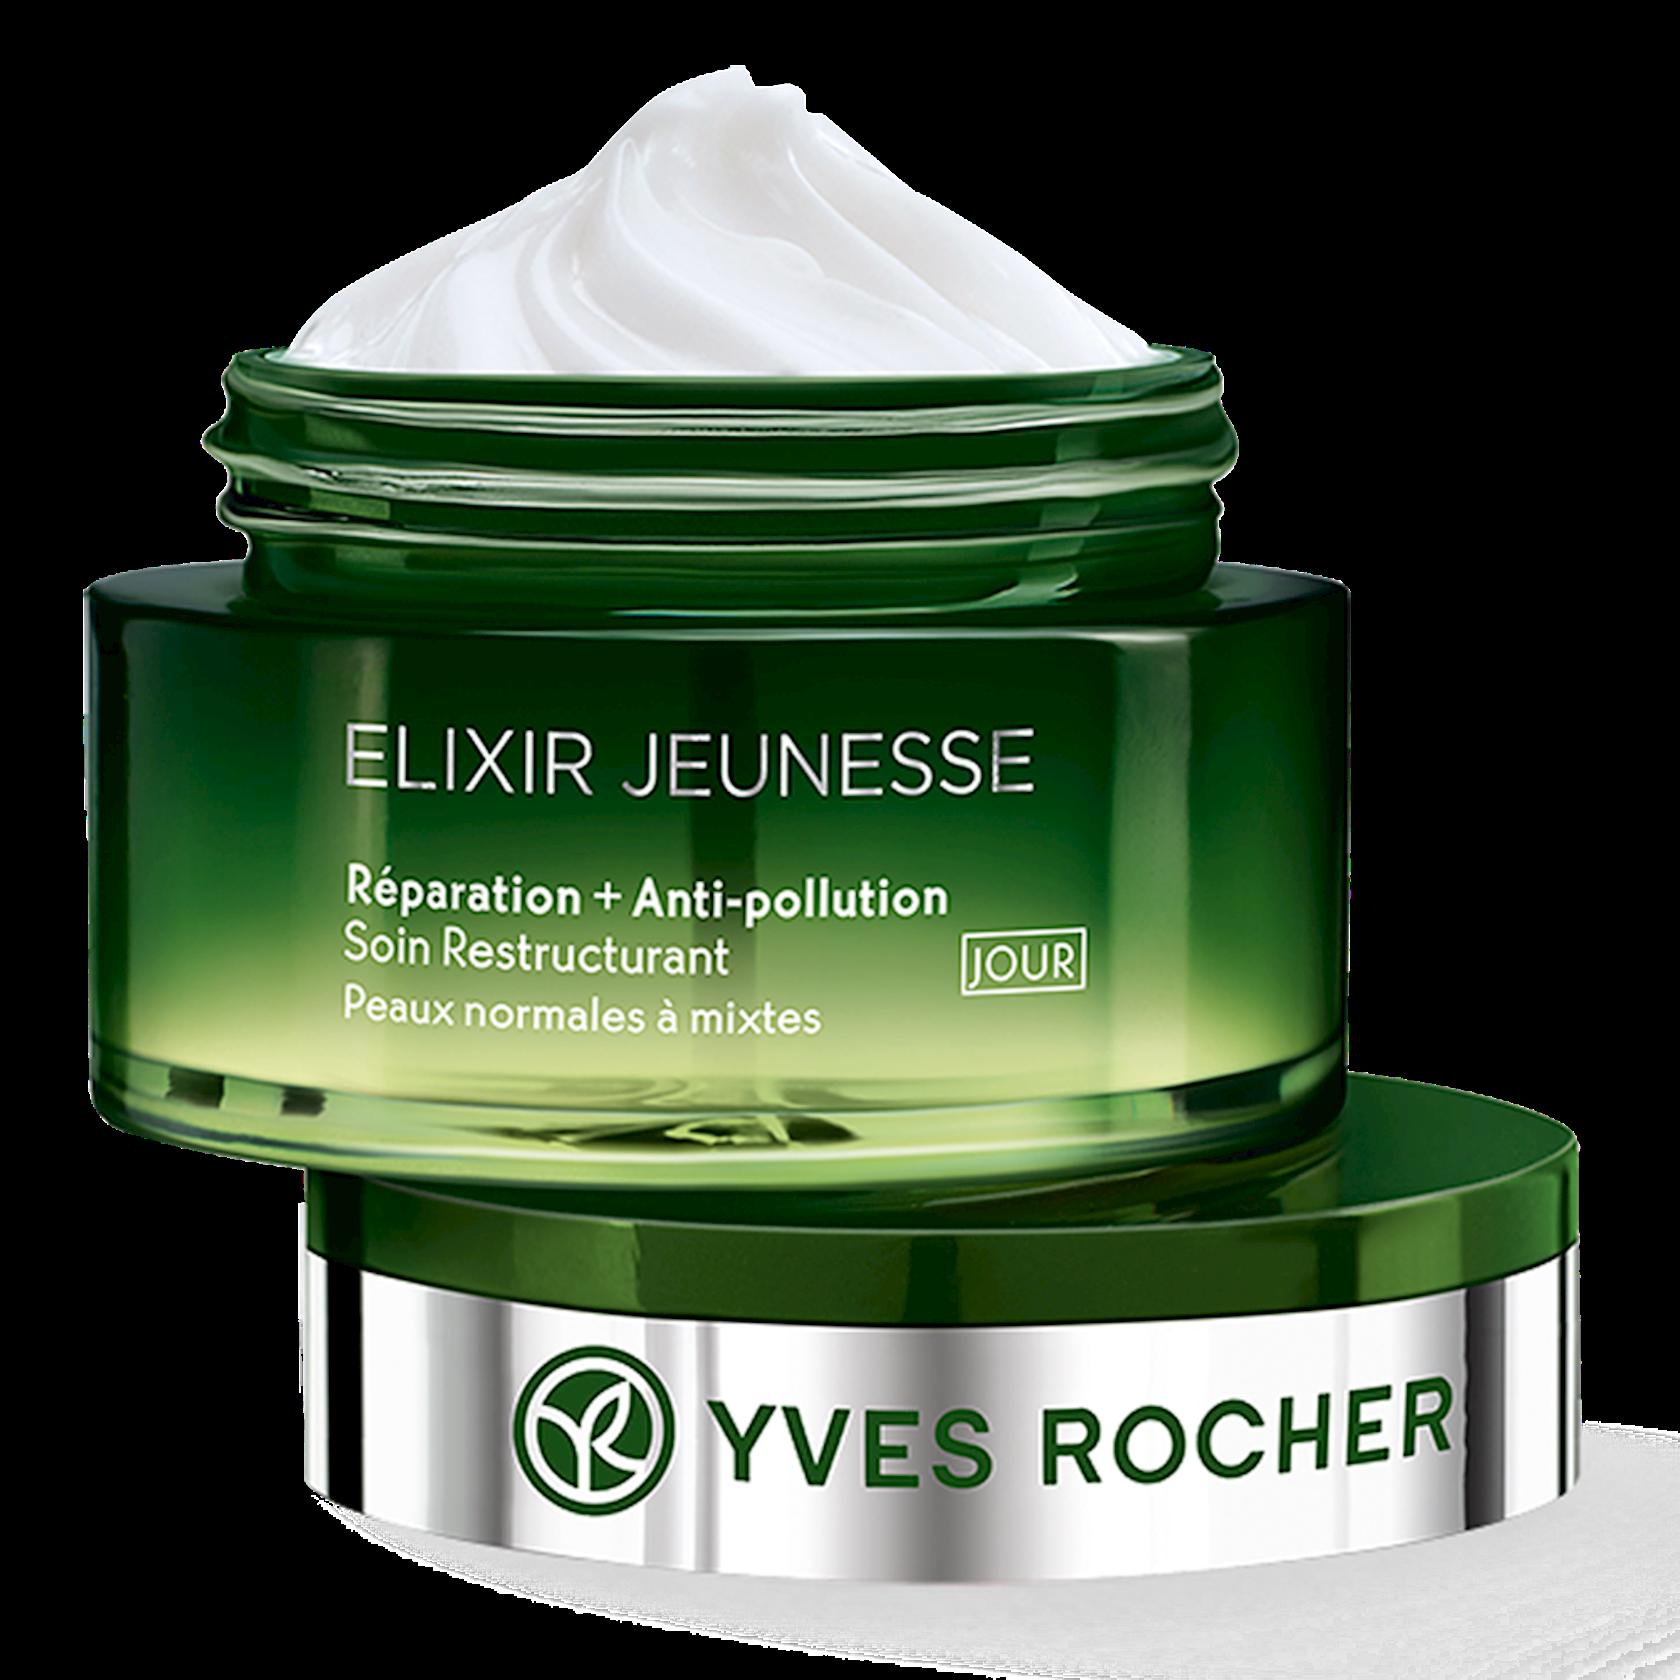 Gündüz üz kremi Yves Rocher Regenerating Day Cream Repair  Antipollution Normal to combination skin 50 ml